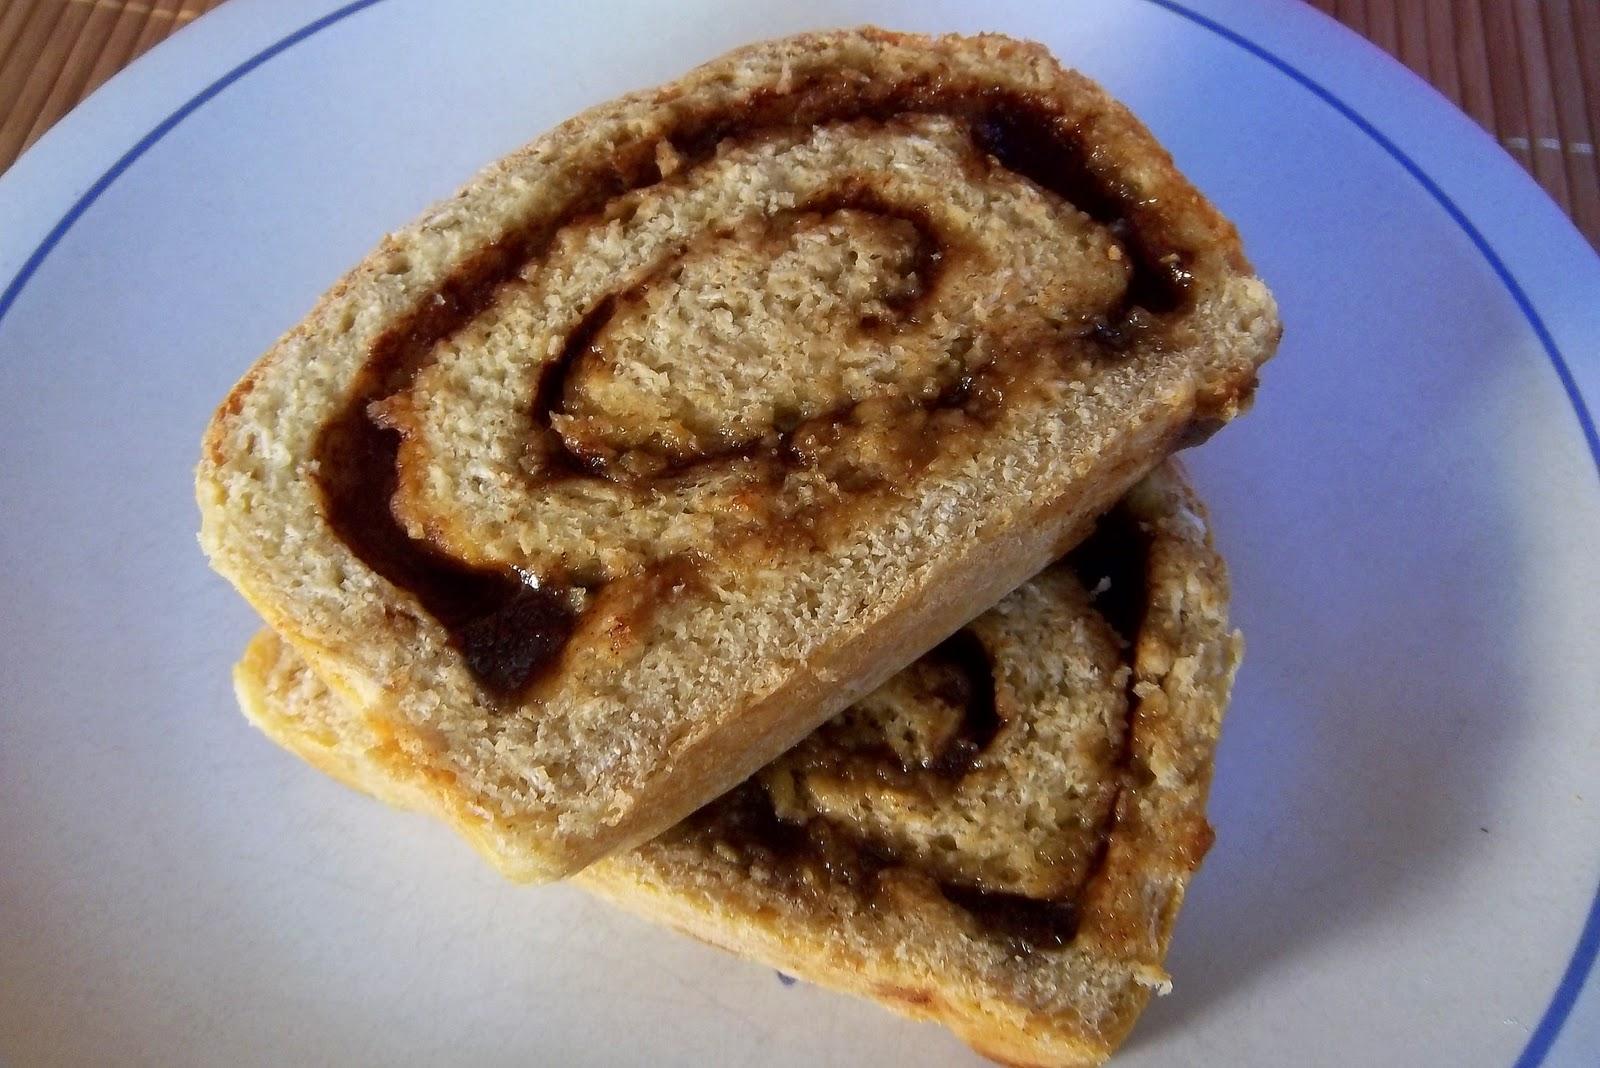 Maple and Brown Sugar Swirl Oatmeal Bread